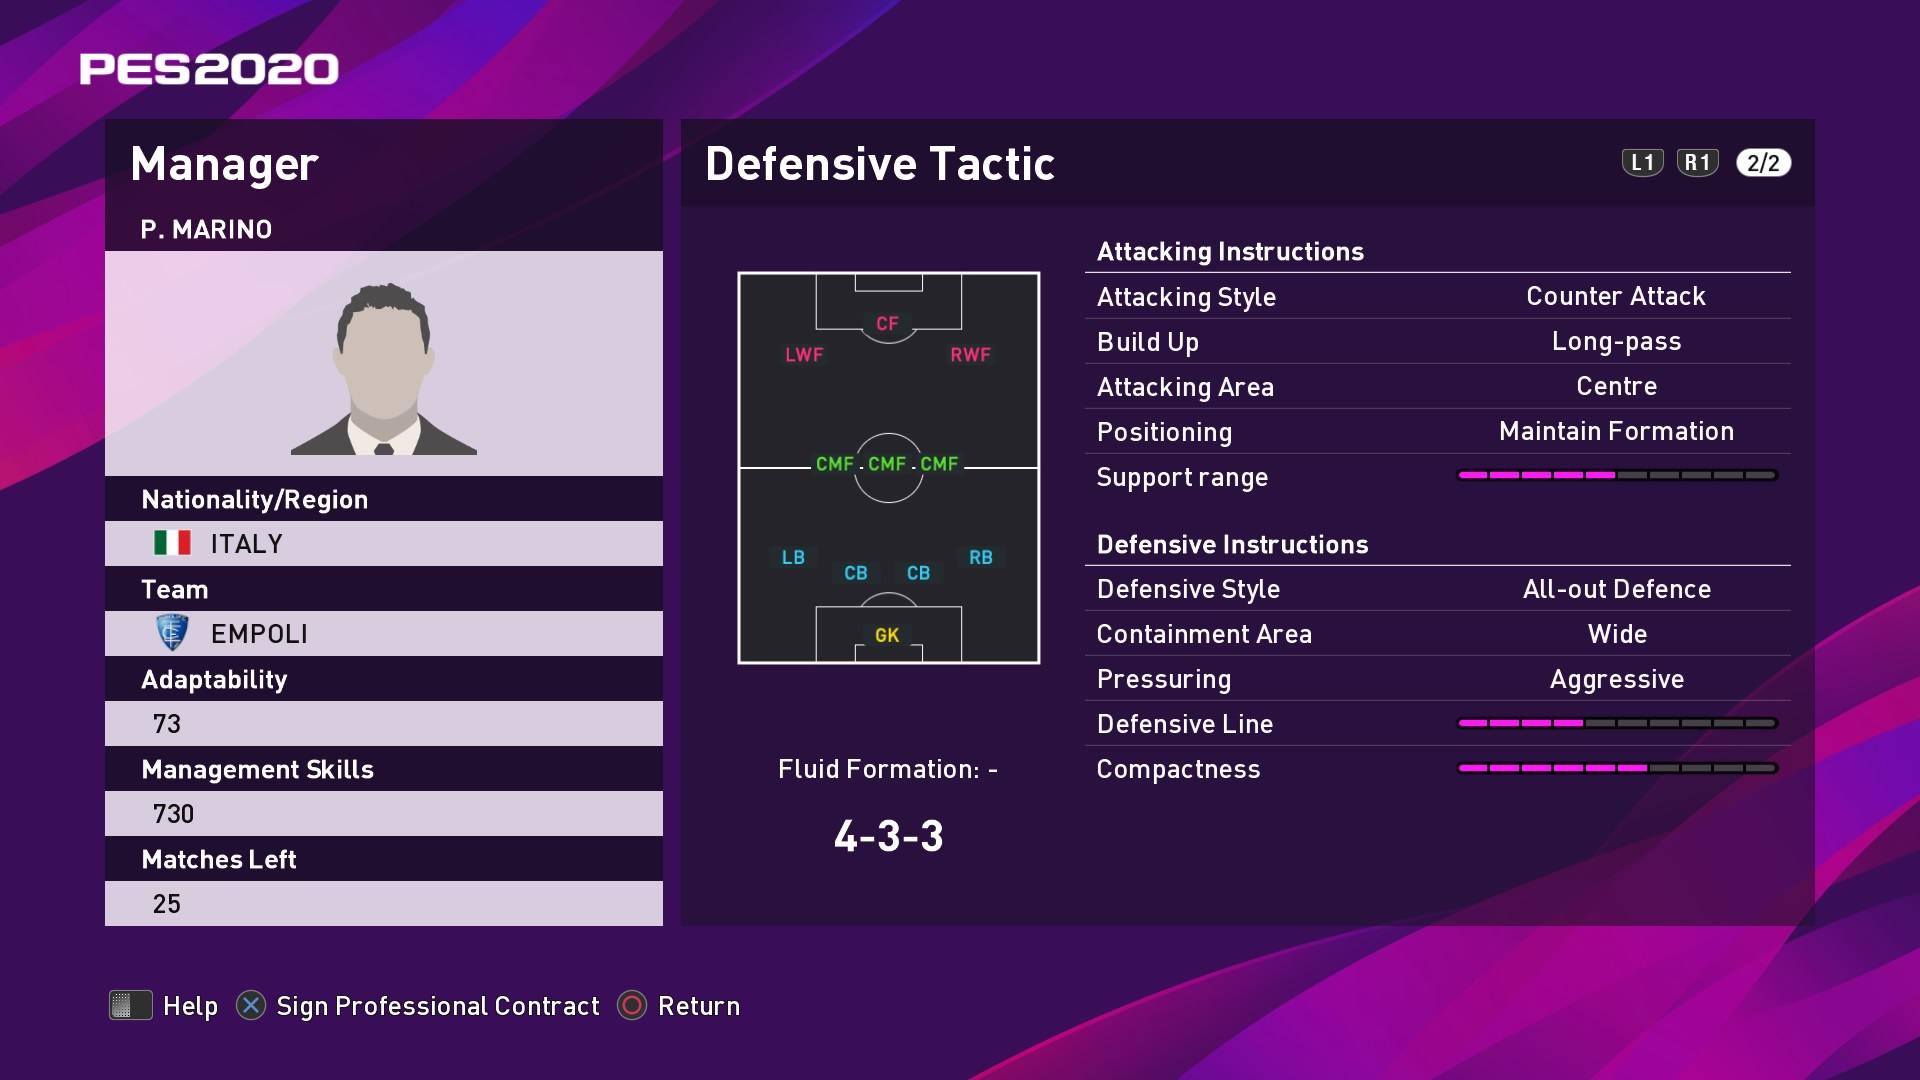 P. Marino (Pasquale Marino) Defensive Tactic in PES 2020 myClub